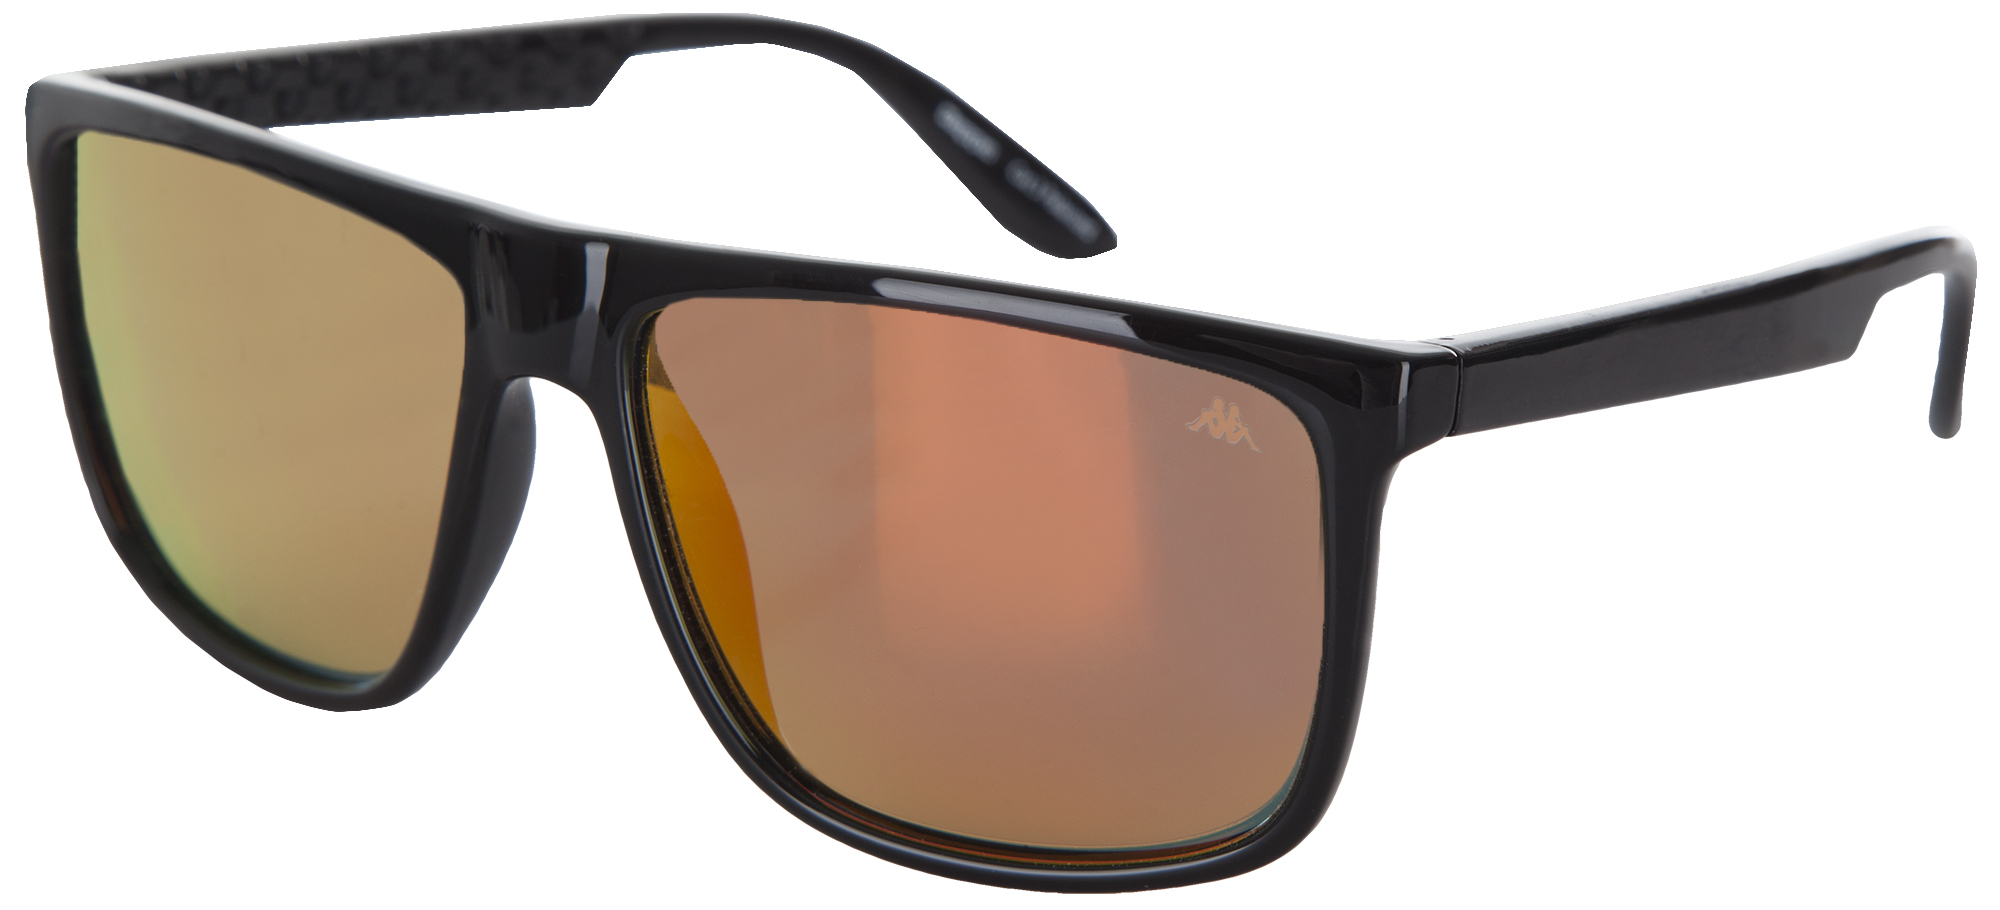 Kappa Солнцезащитные очки Kappa infinity kappa 1200w